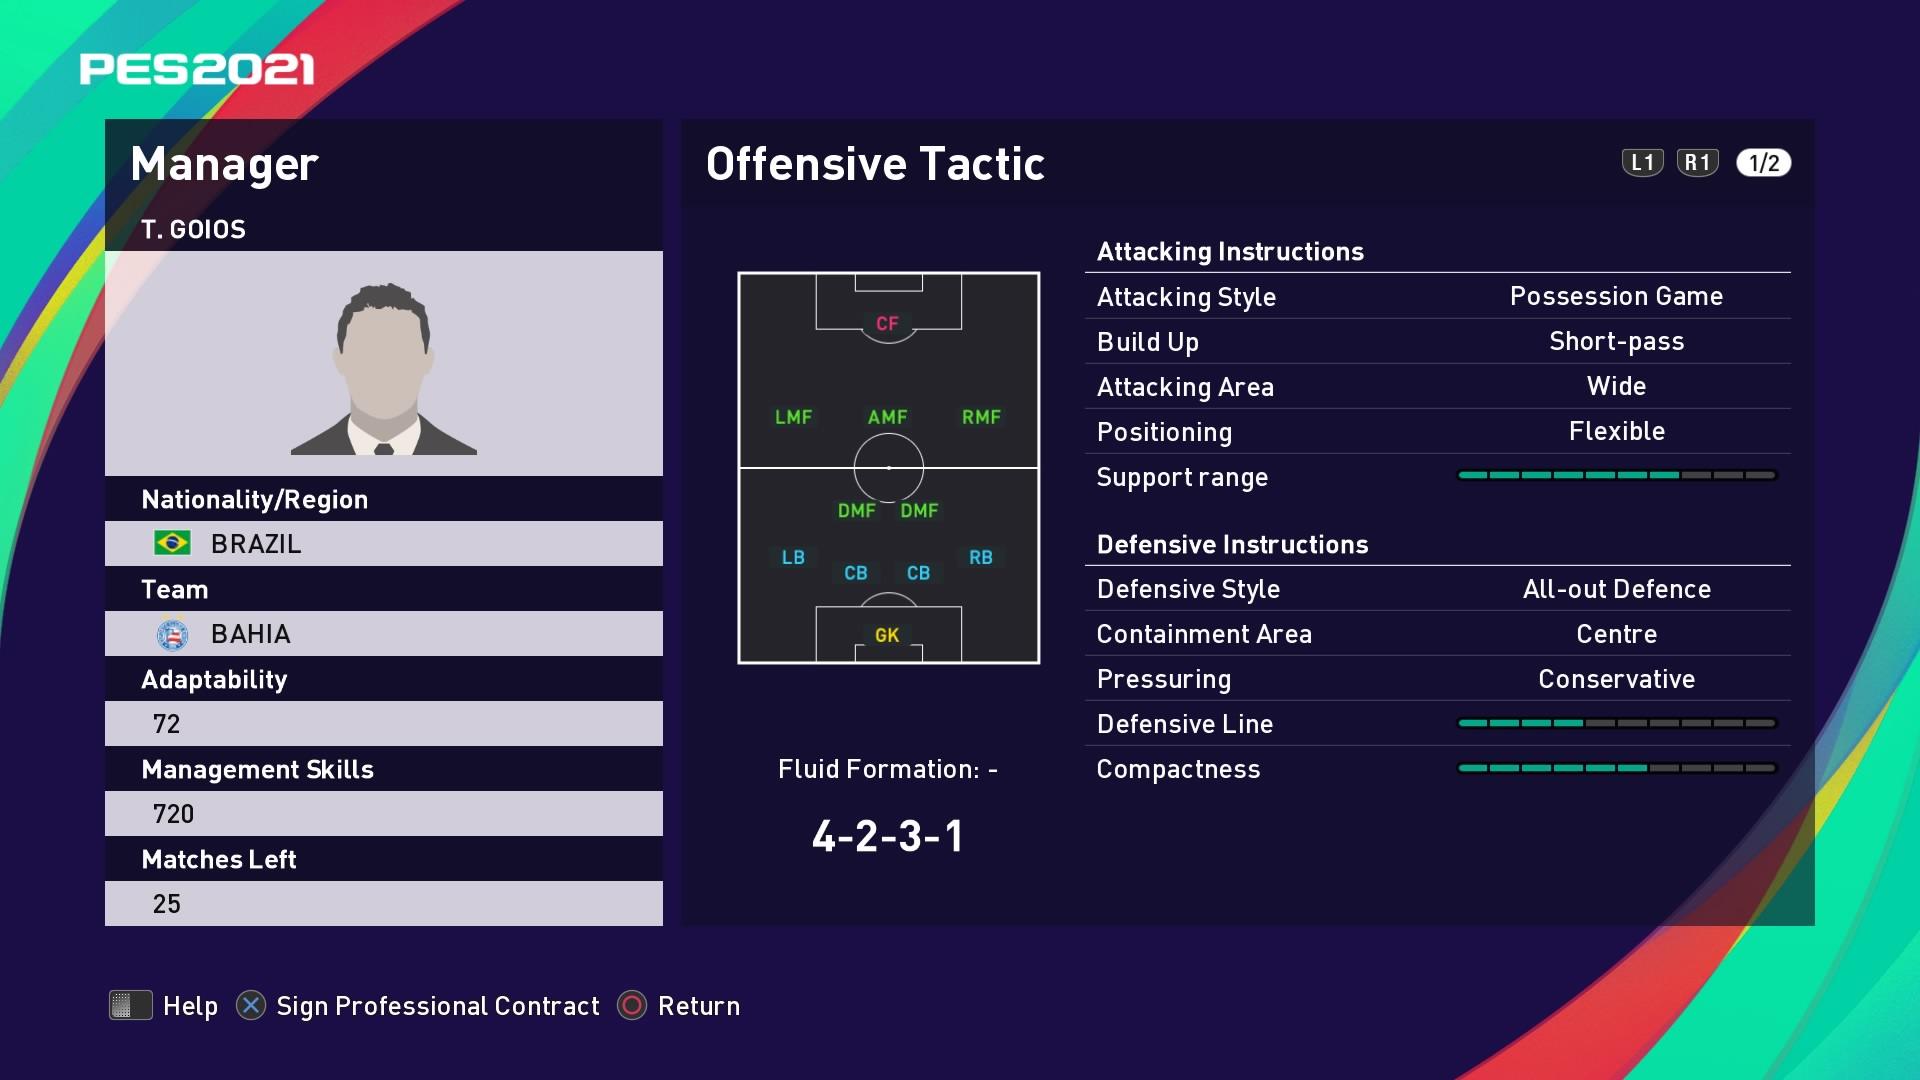 T. Goios (Roger Machado) Offensive Tactic in PES 2021 myClub